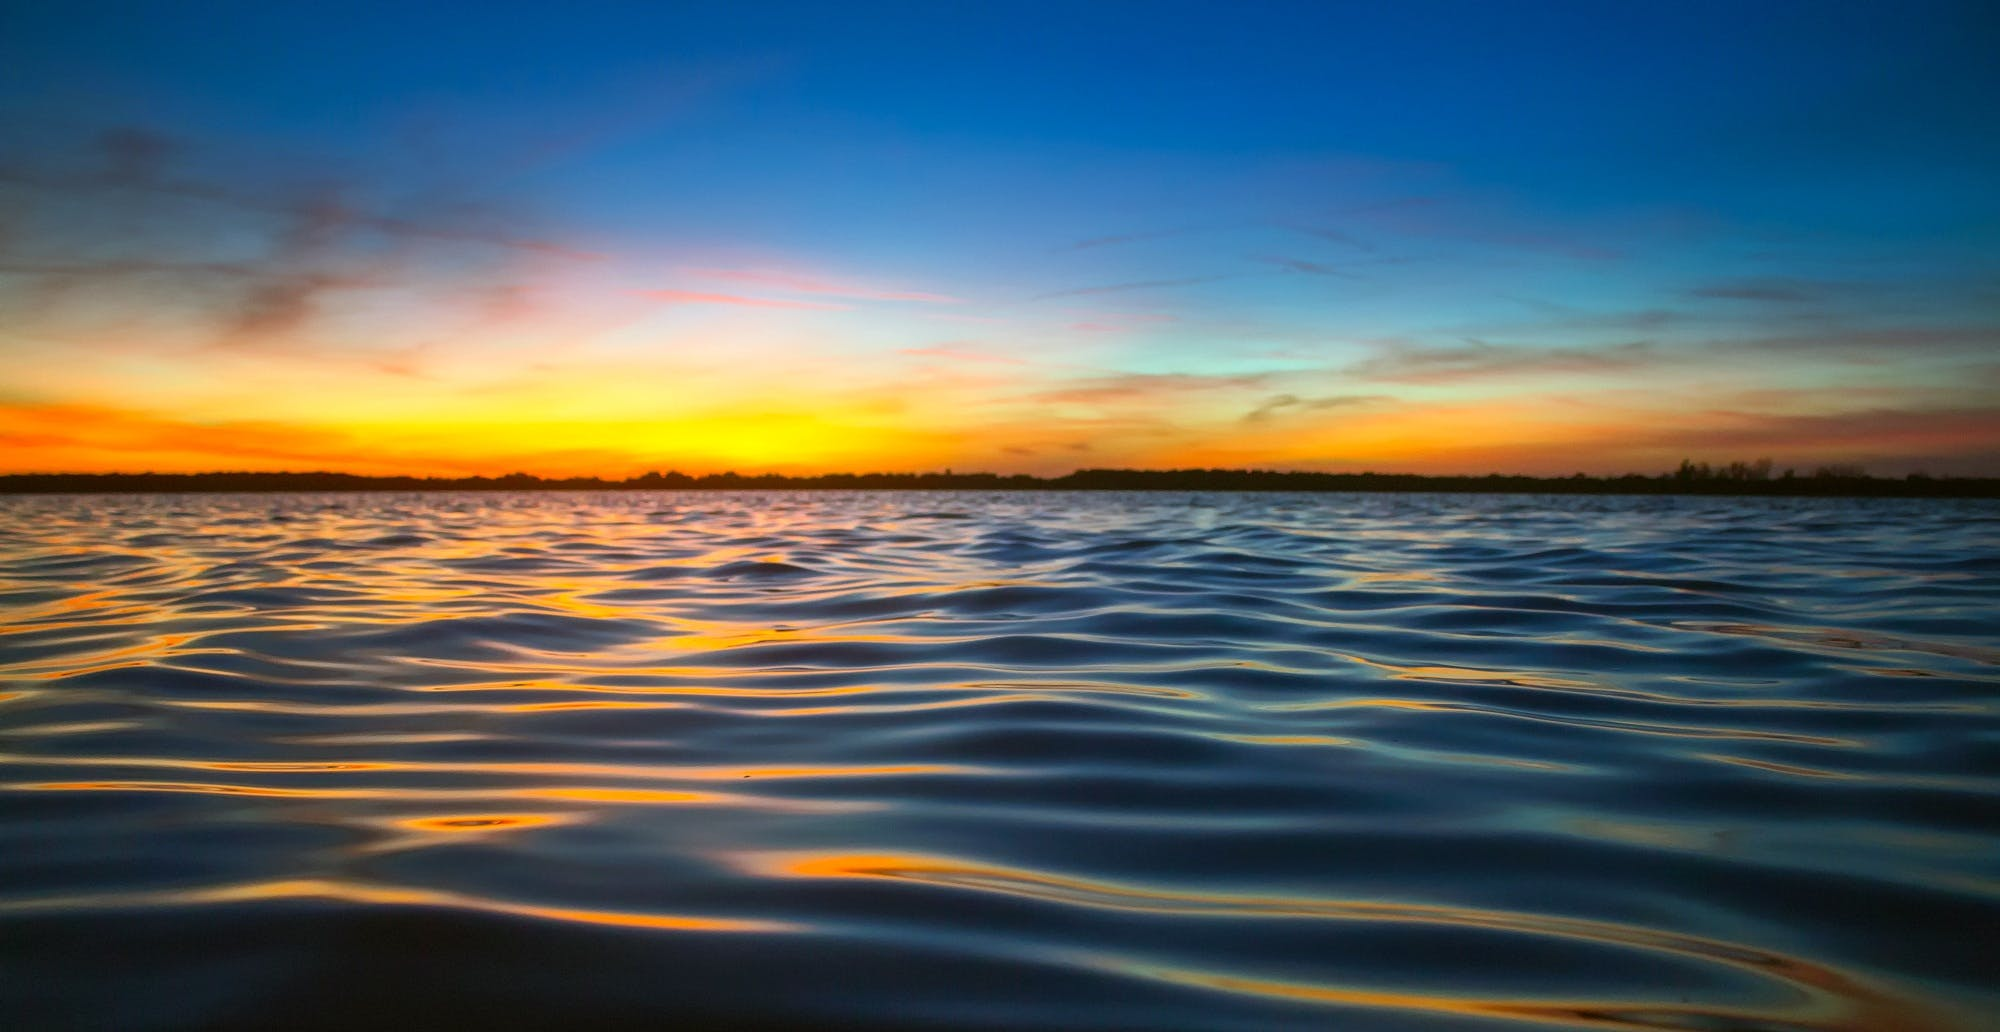 Free stock photo of nature, sky, sunset, water